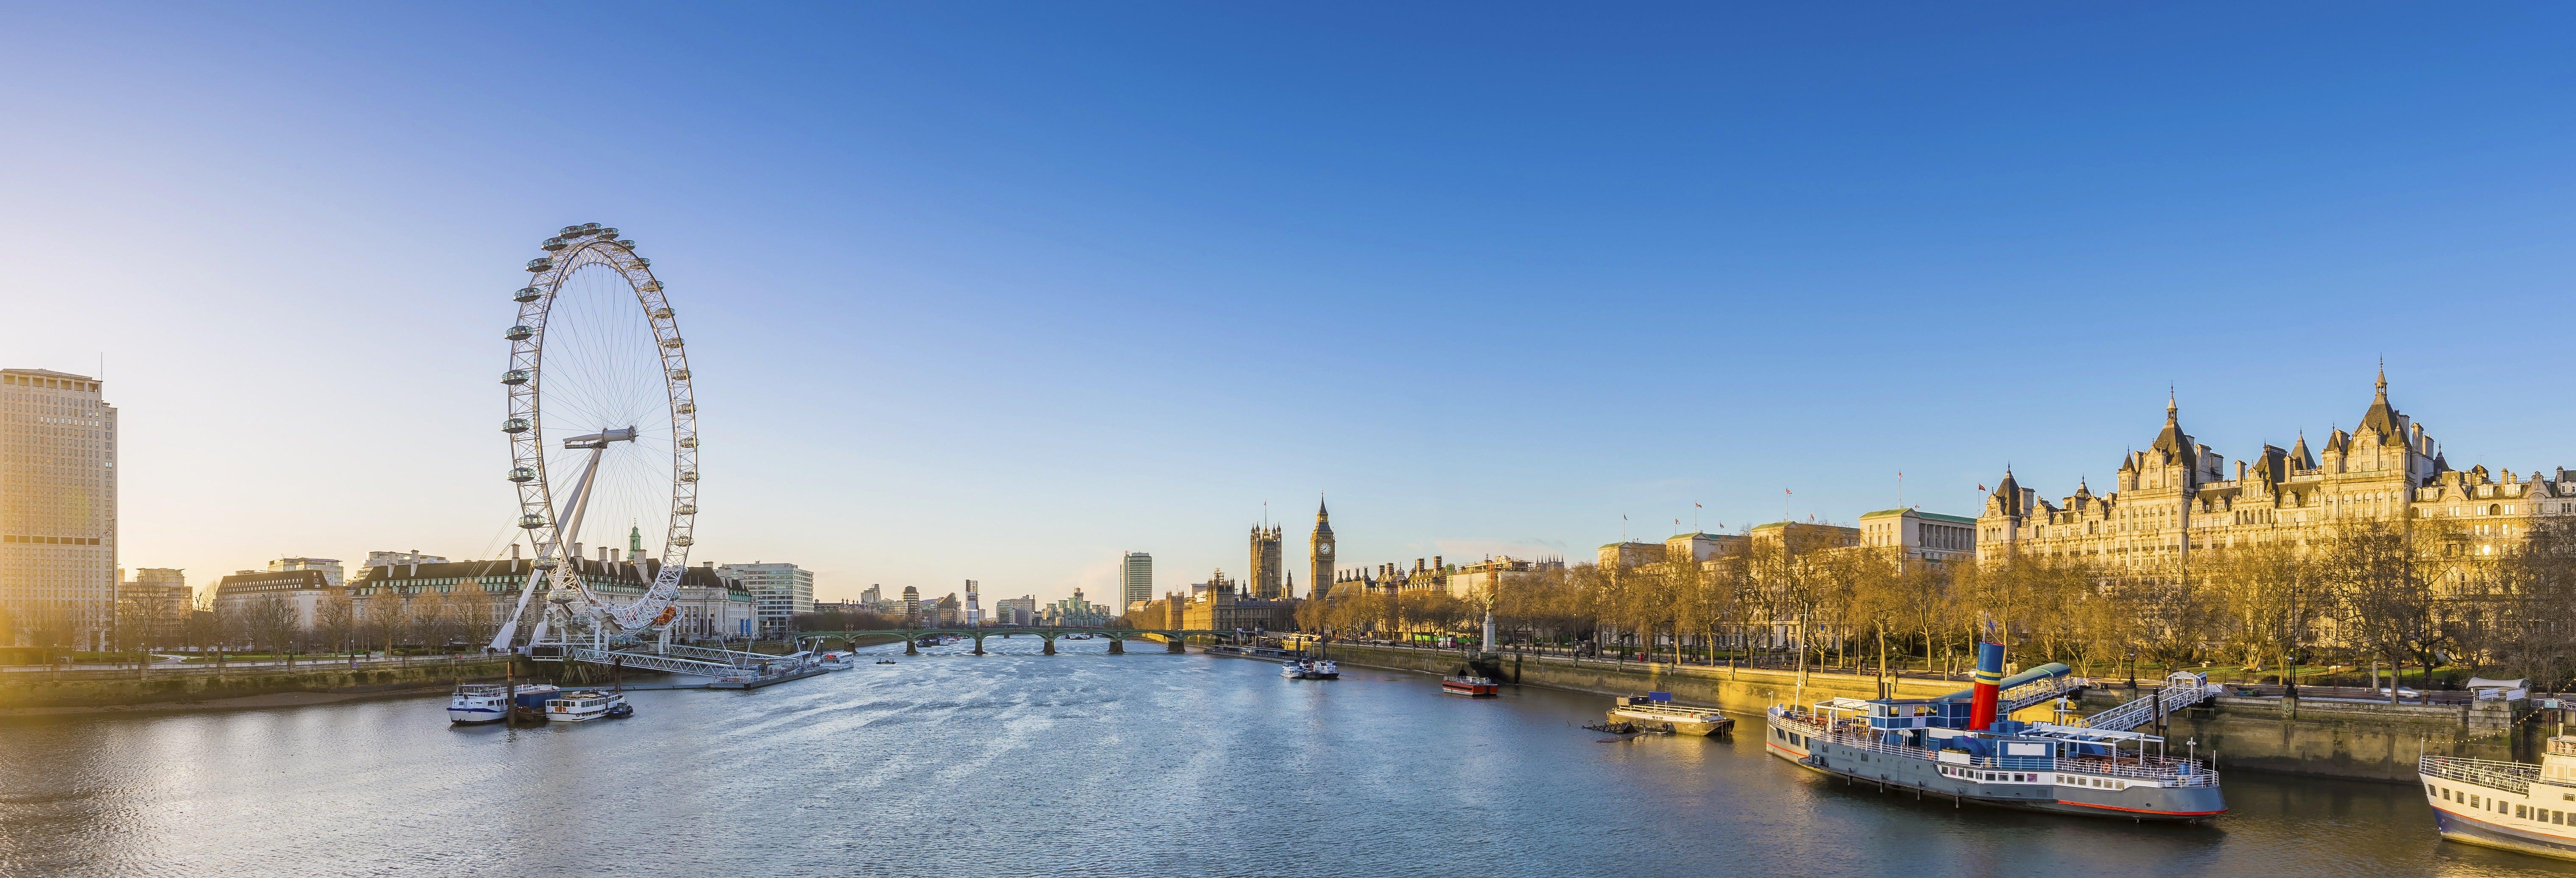 Excursión a Londres para cruceros